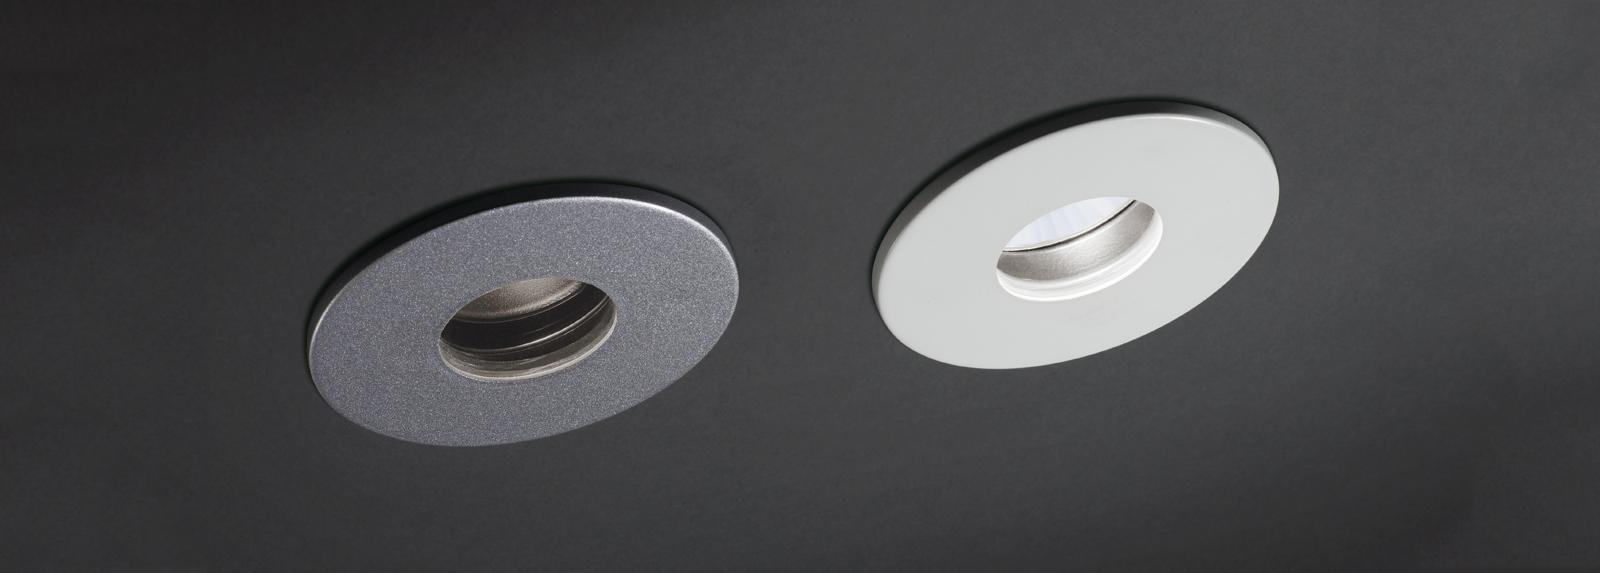 Ip65 Small Recessed Downlights Pinhole Seal